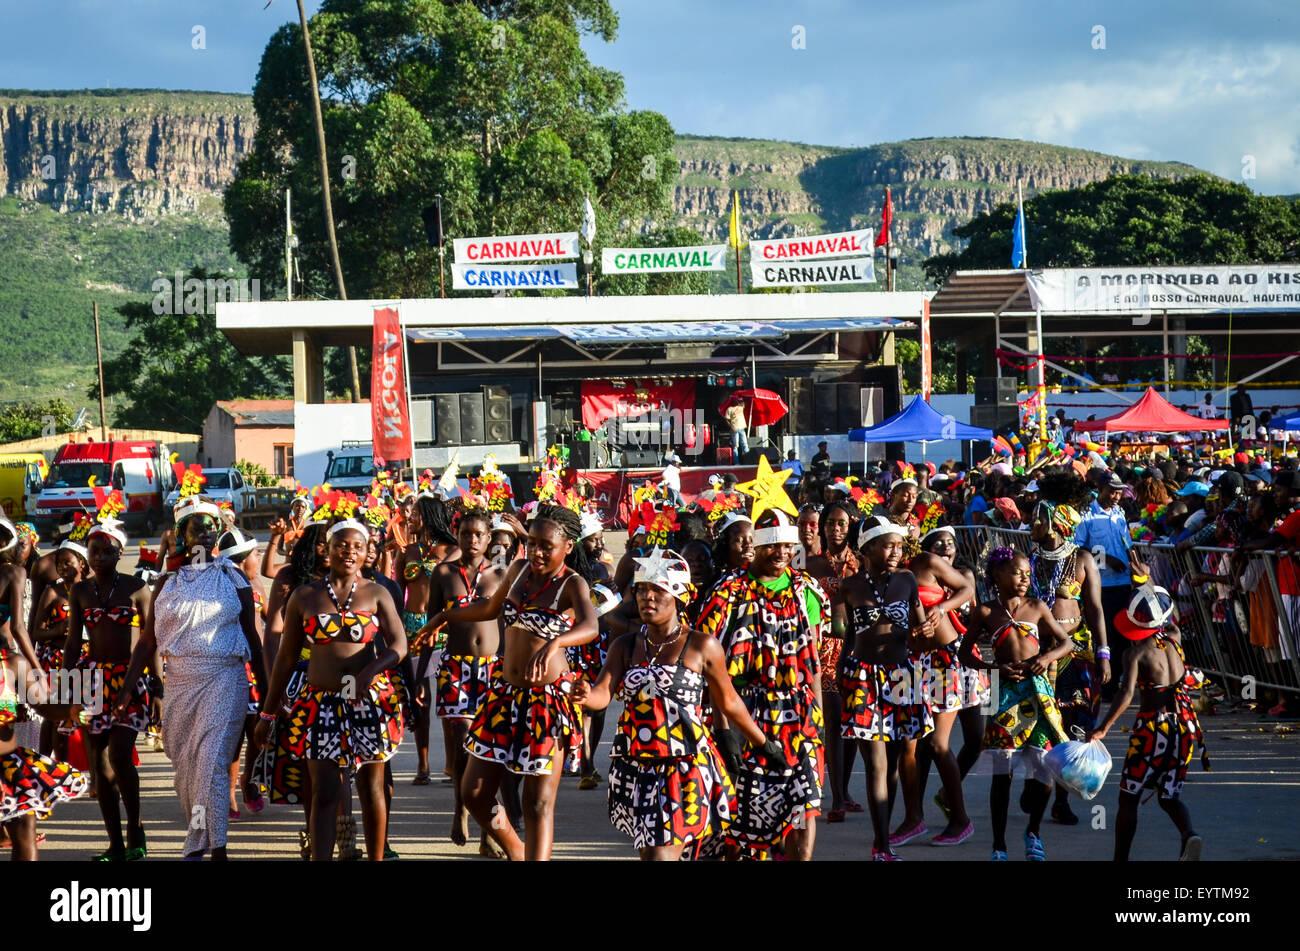 Carnival do Lubango, Angola (2014) - Stock Image